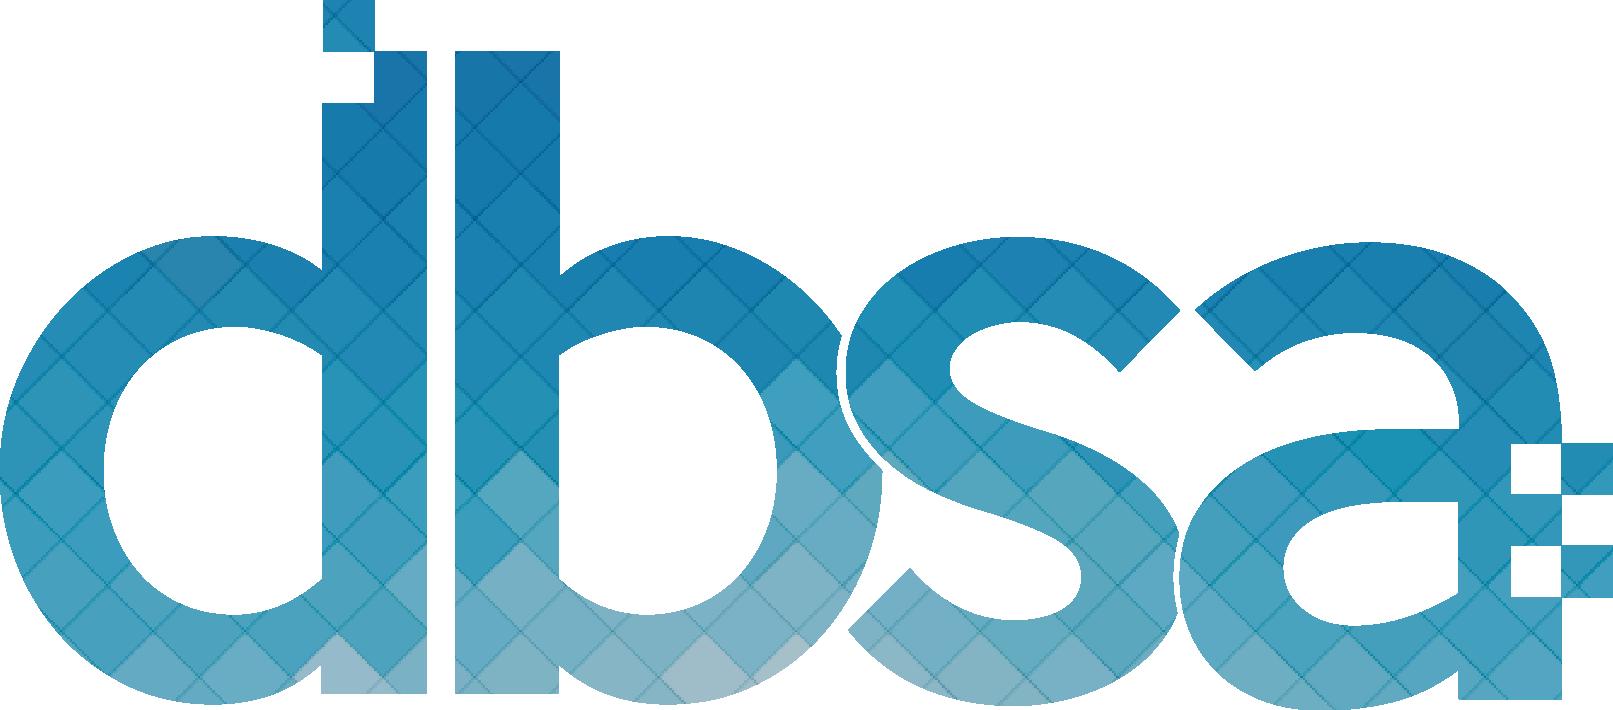 Digital Business Student Association